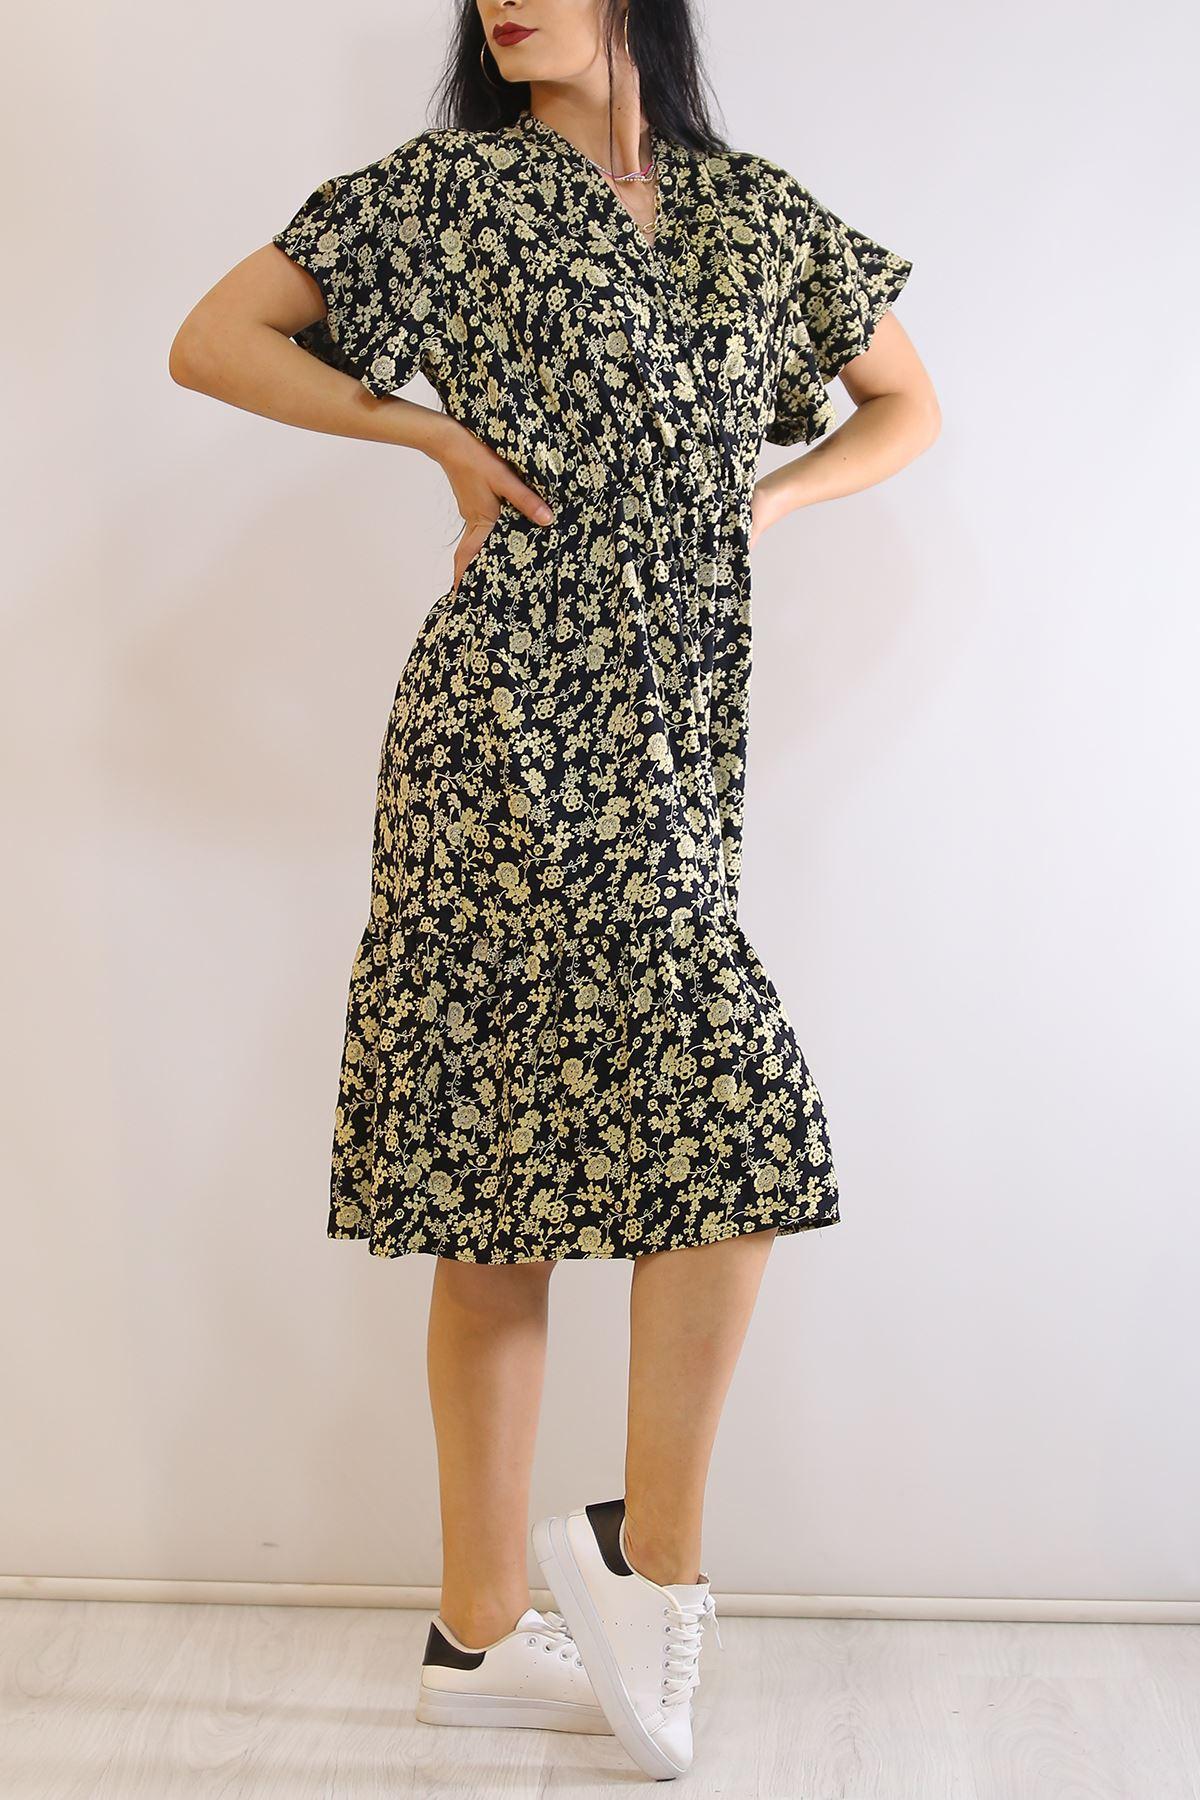 Kruvaze Yaka Elbise Sarısiyah - 5372.701.